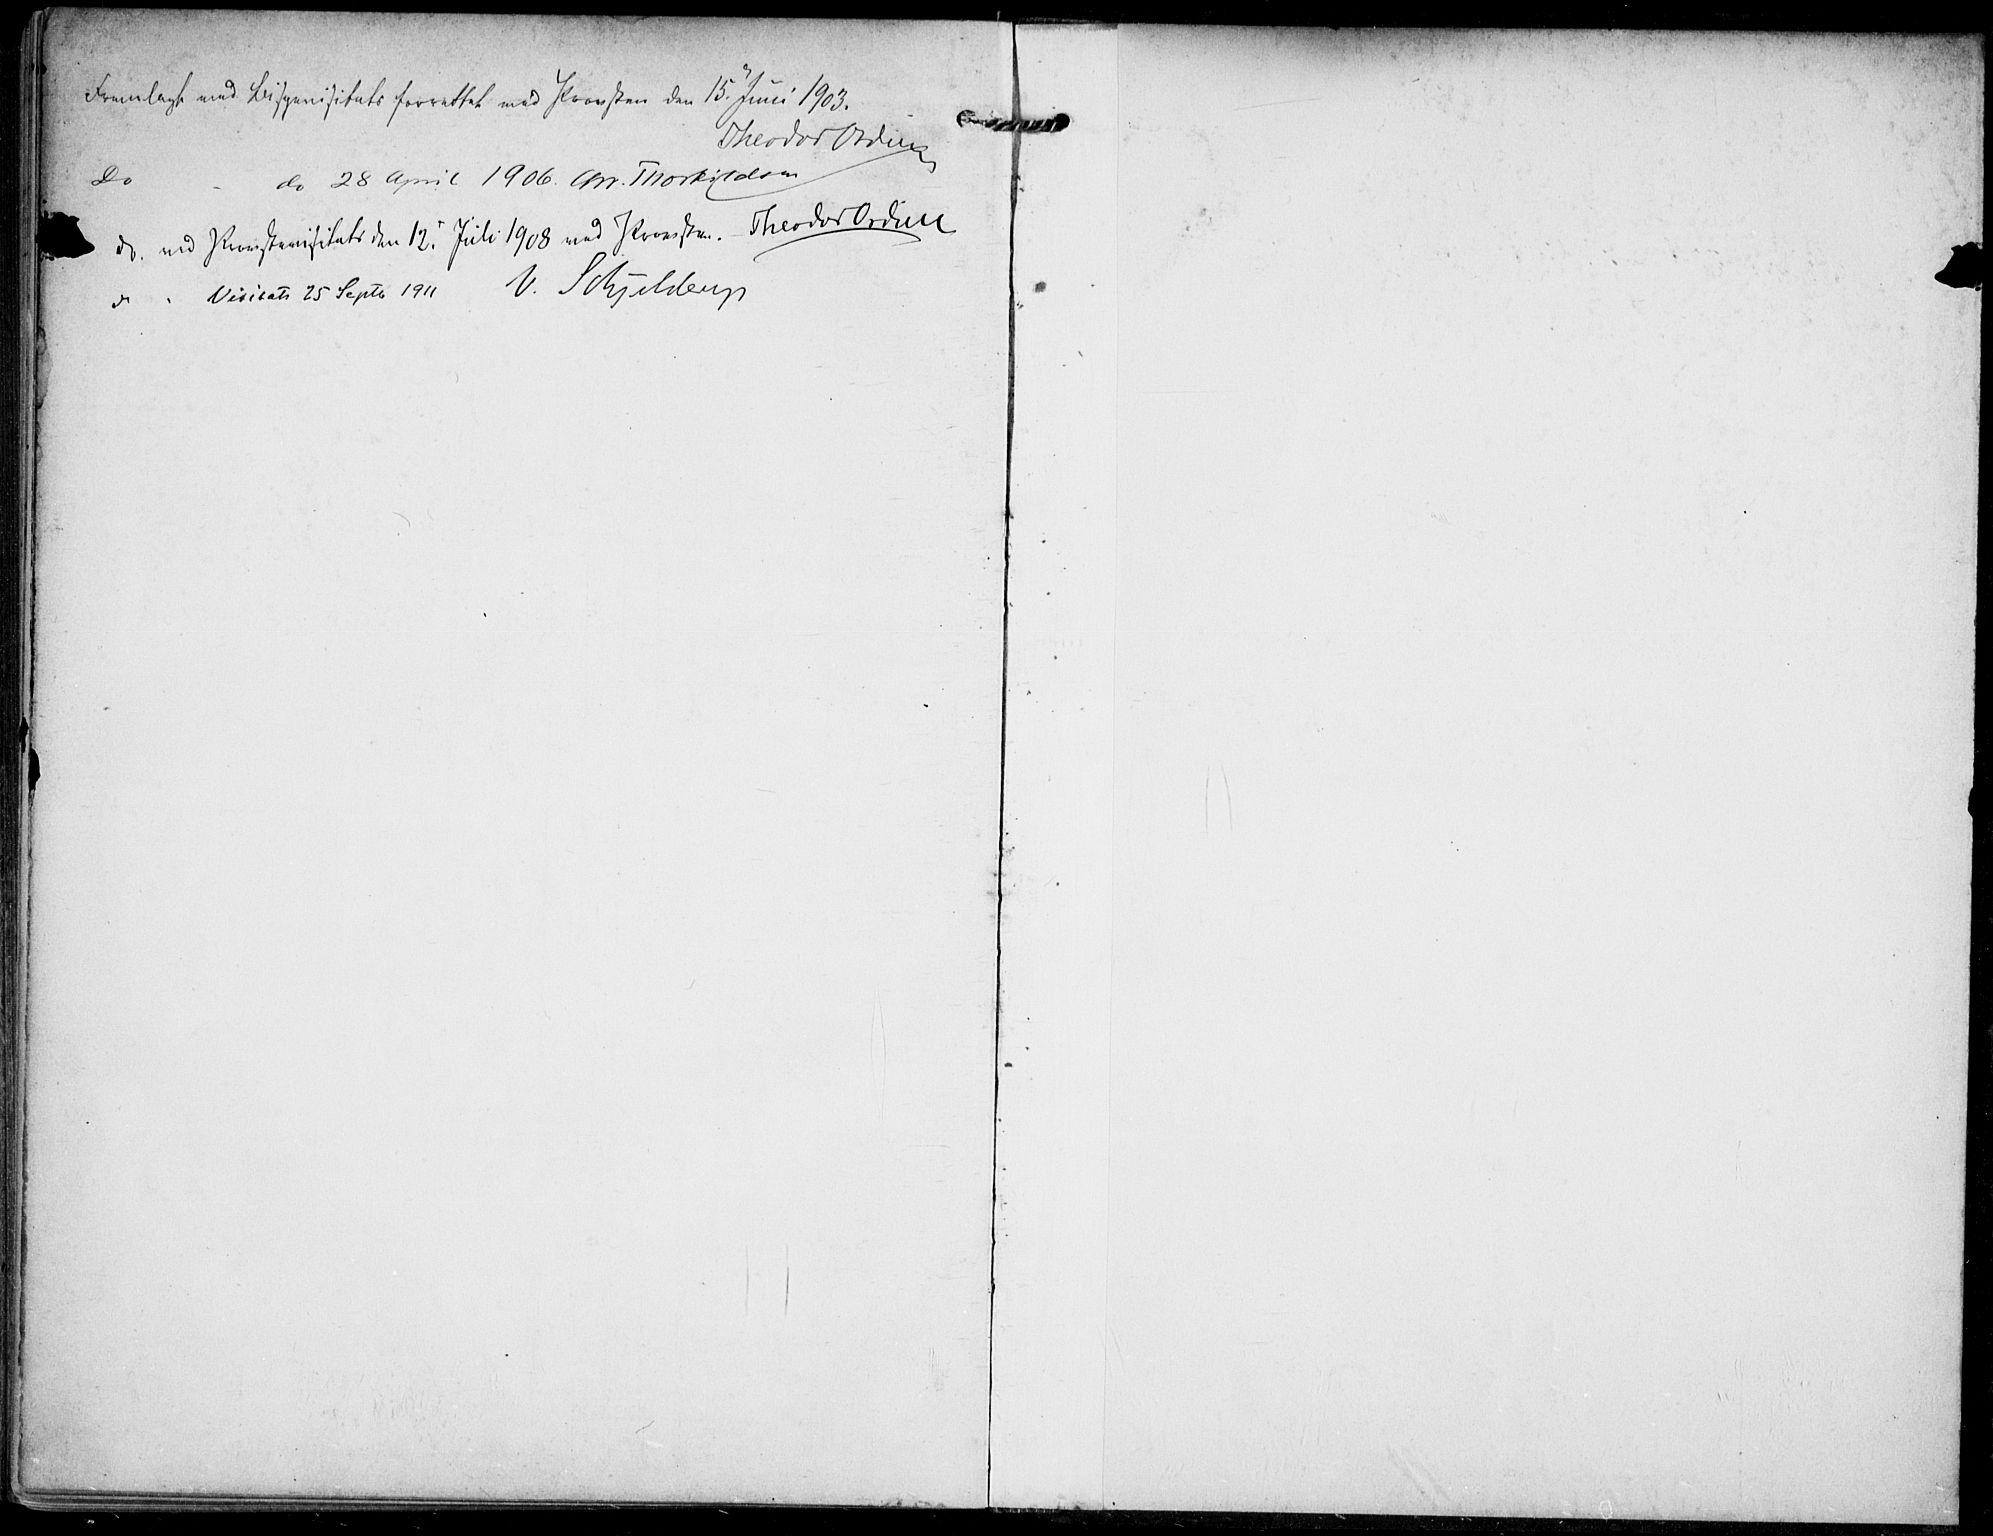 SAKO, Lunde kirkebøker, F/Fa/L0004: Ministerialbok nr. I 4, 1902-1913